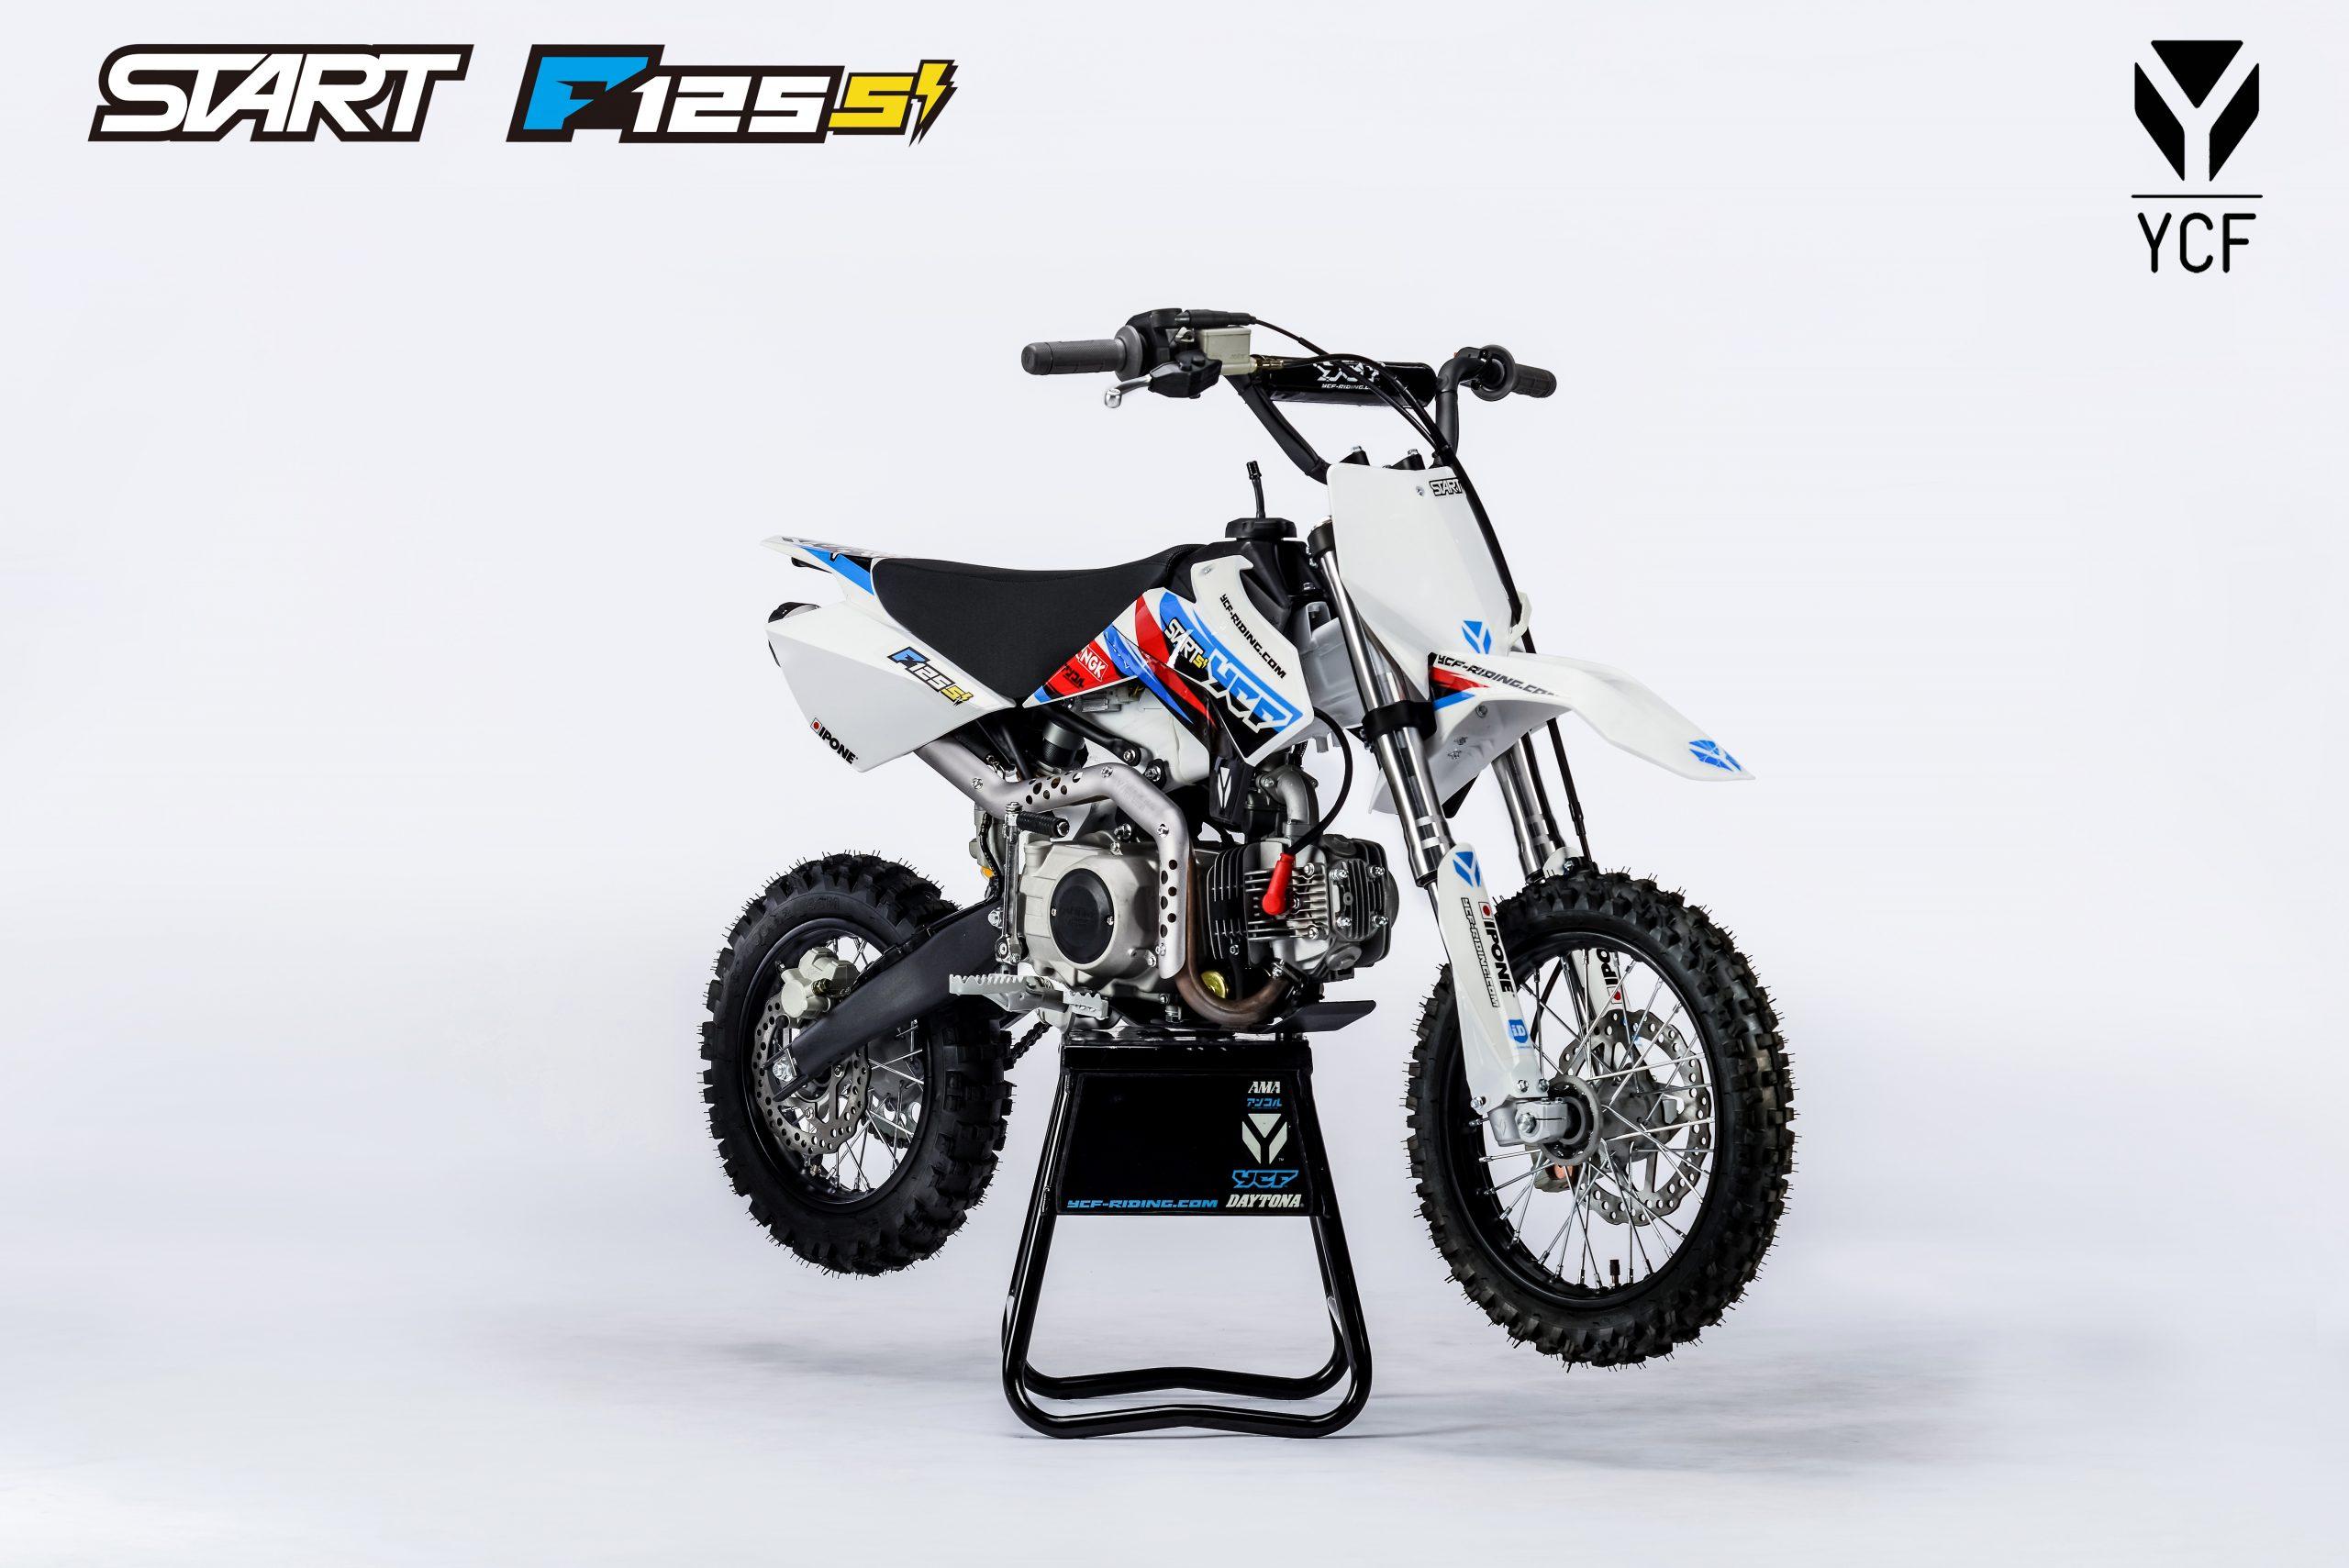 ПИТБАЙК YCF START F125SE 2021  Артмото - купить квадроцикл в украине и харькове, мотоцикл, снегоход, скутер, мопед, электромобиль